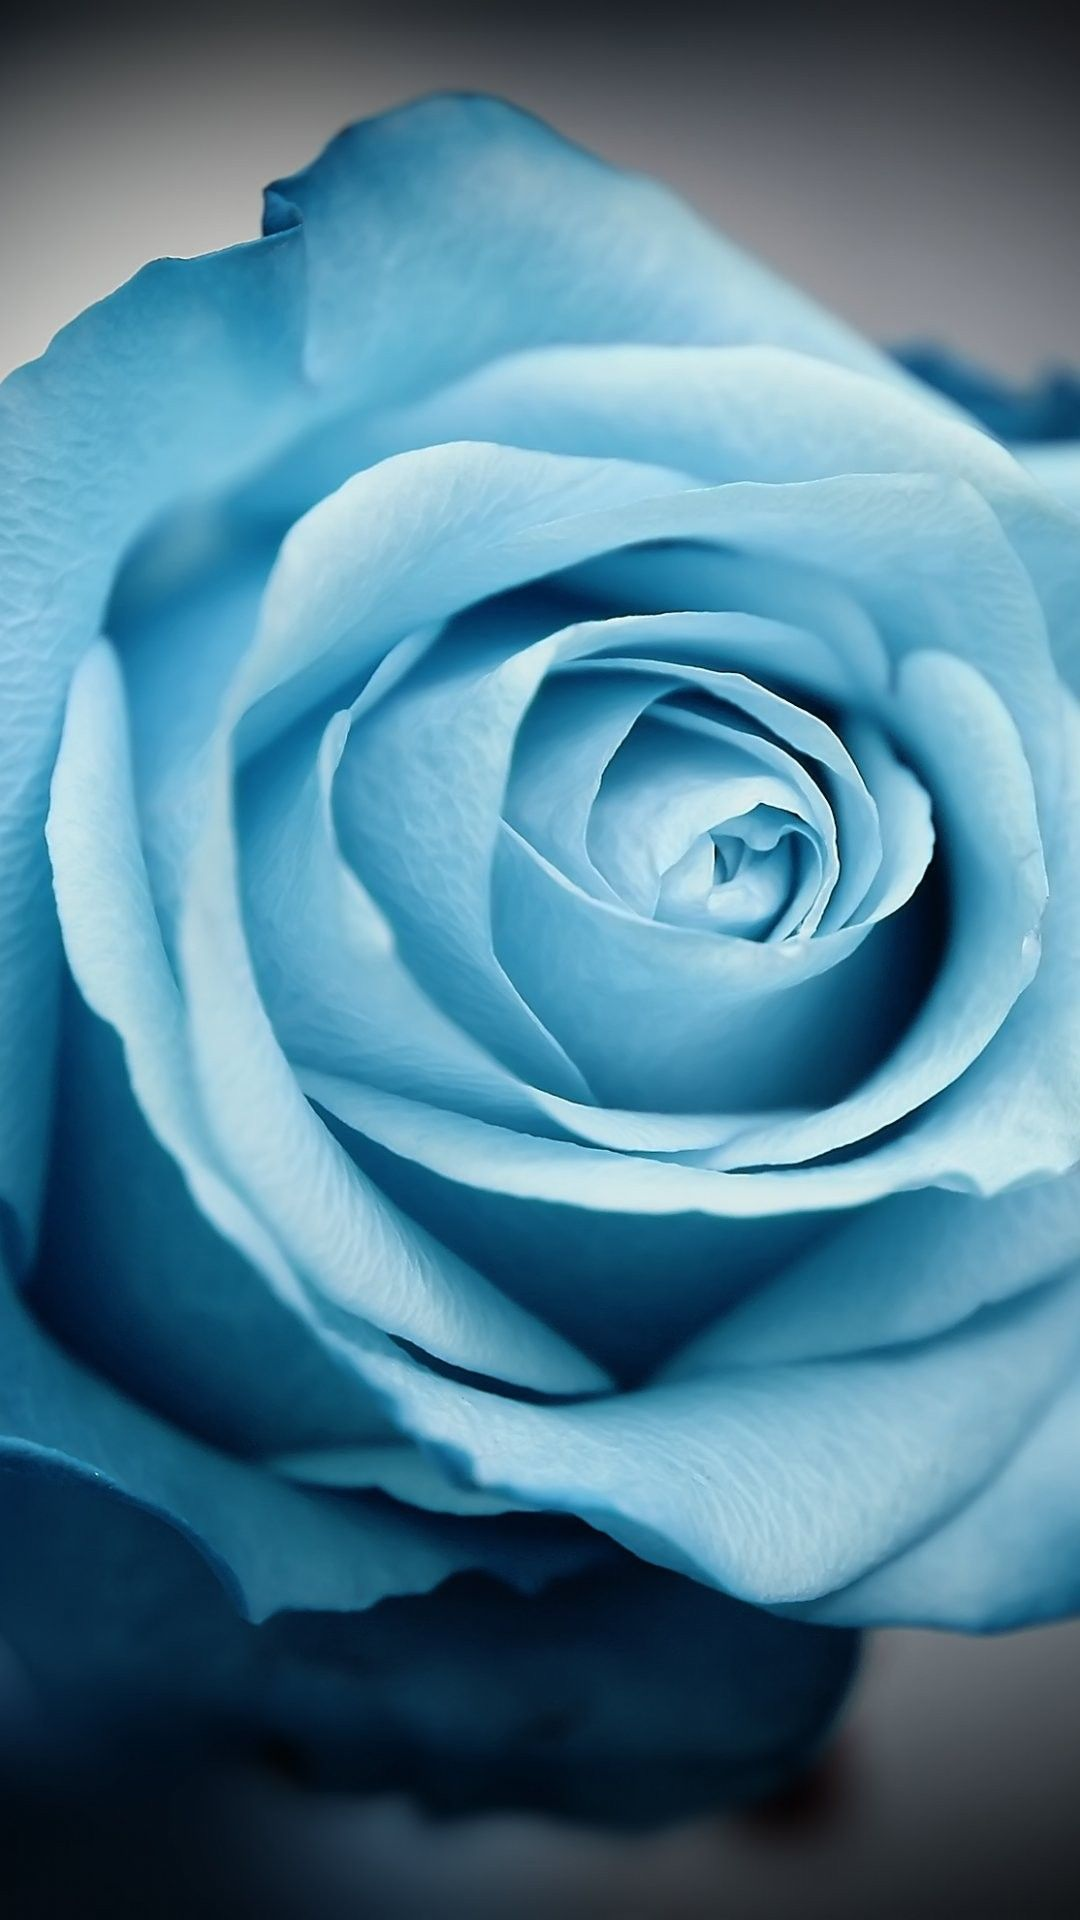 iPhone wallpapers blue flowers Flower Flowers Wallpaper